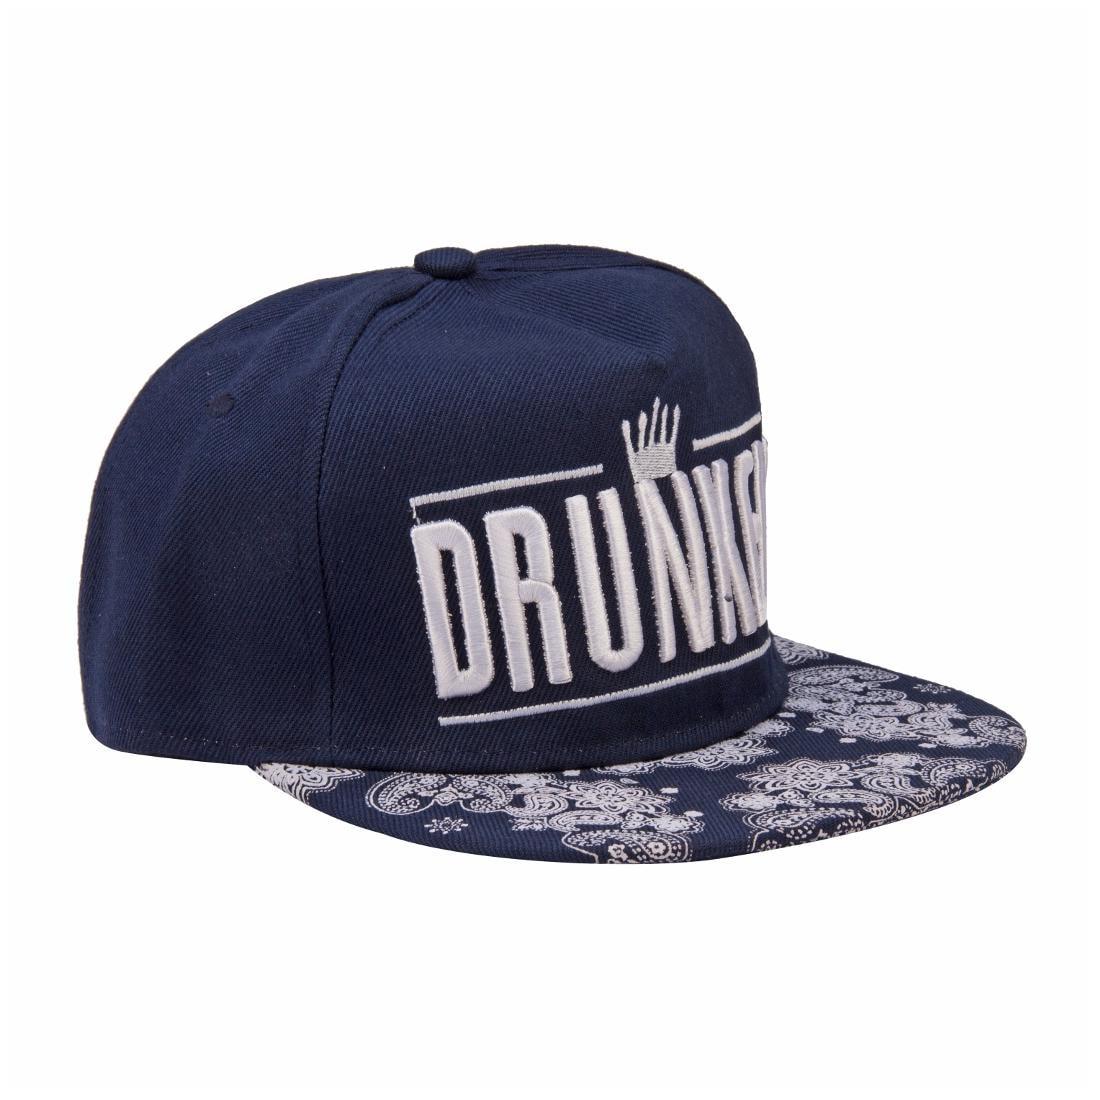 Buy ILU 3D Drunken Paisley Caps for Men Women Snapback Hiphop Cap Free Size  Adjustable Online at Low Prices in India - Paytmmall.com 531ac08d27de